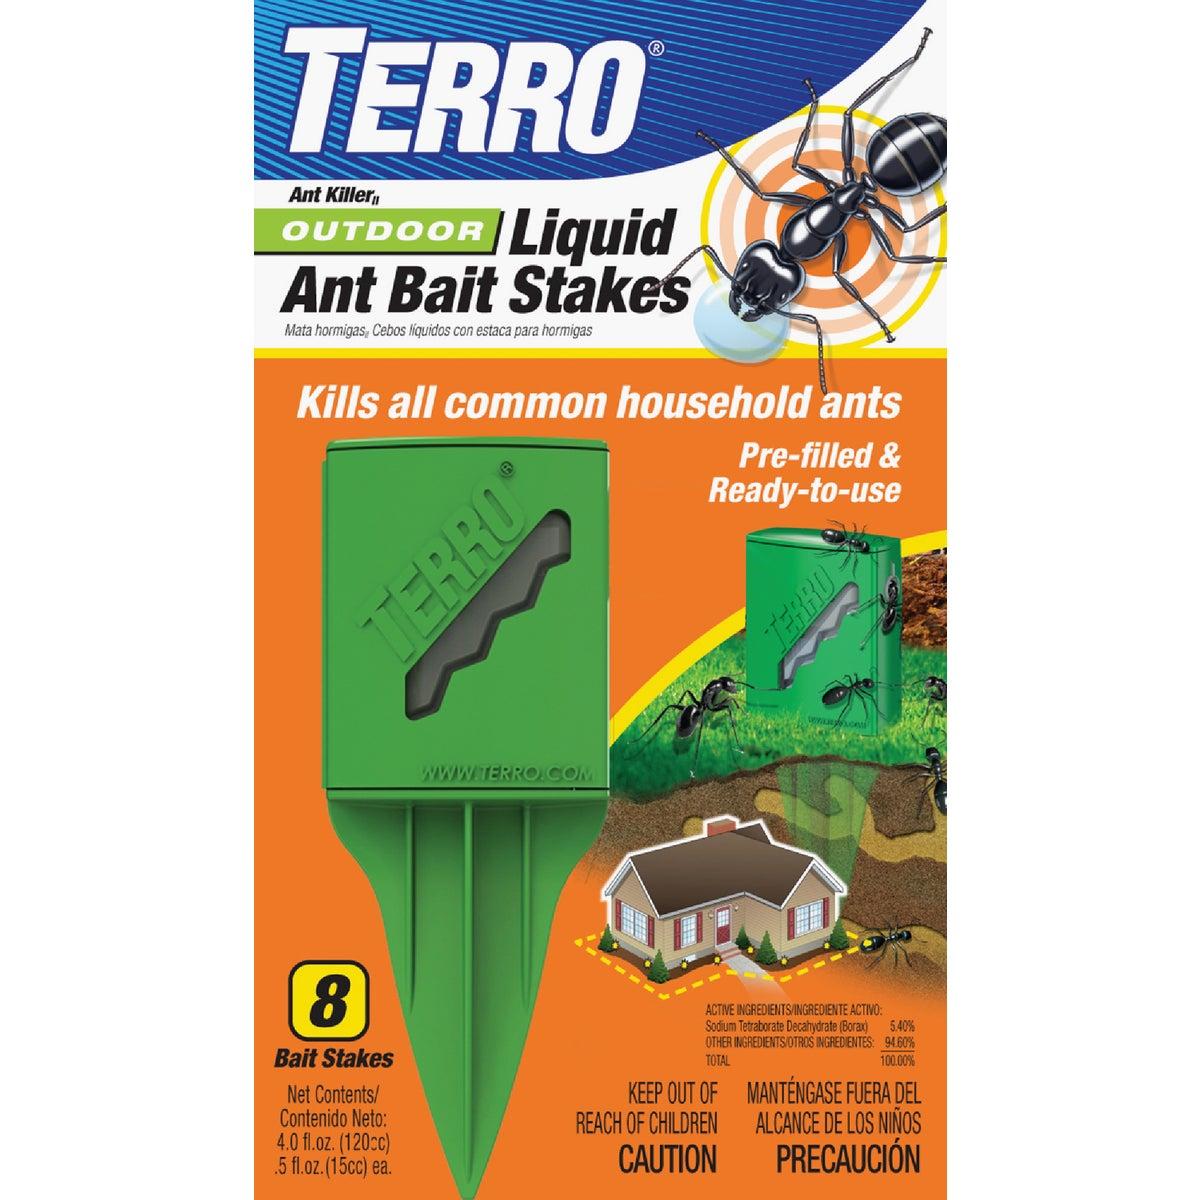 OTDR LQD ANT BAIT STAKE - T1812 by Woodstream Corp